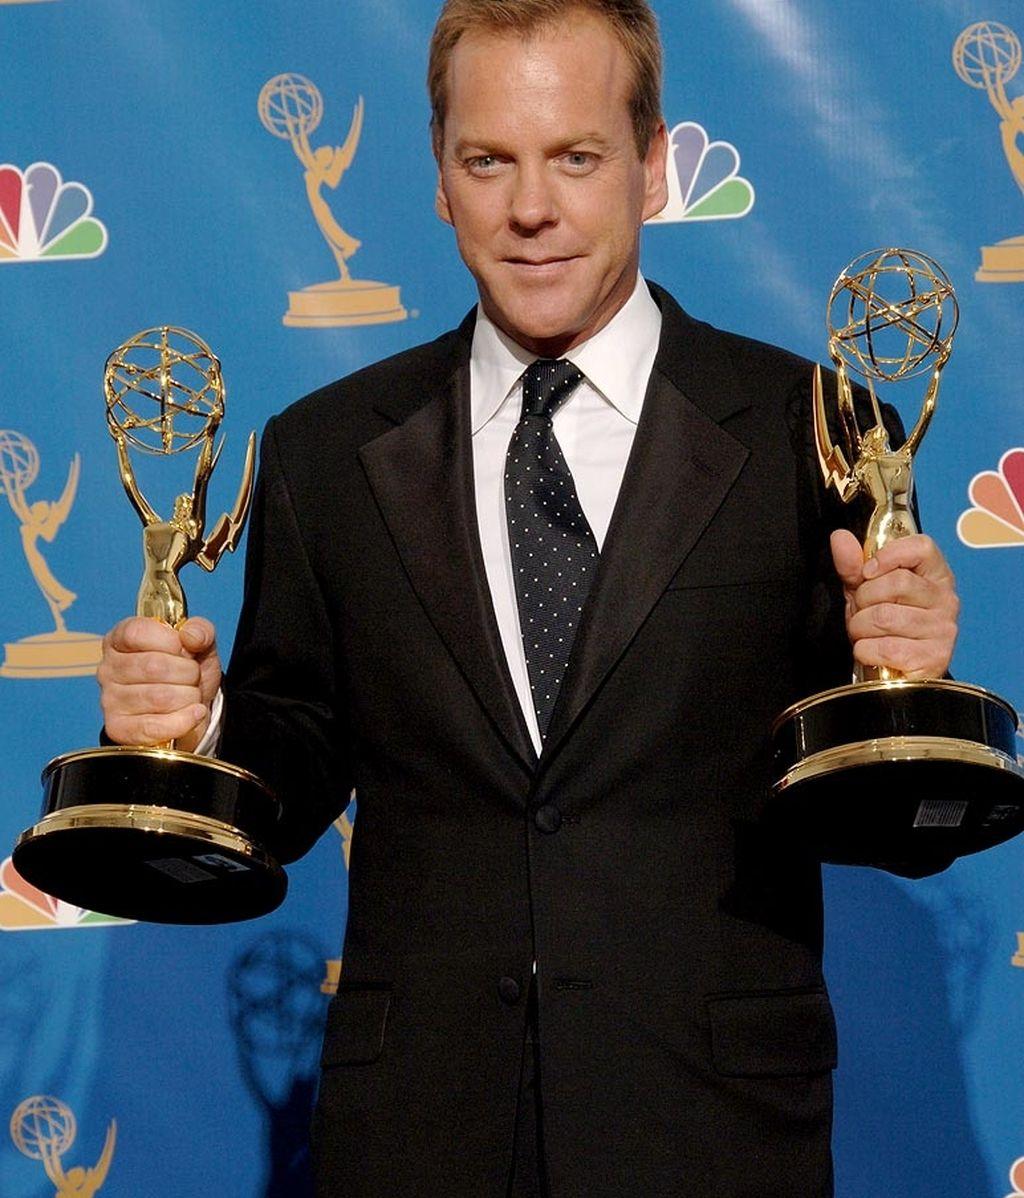 Kiefer Sutherland en los Premios Emmy